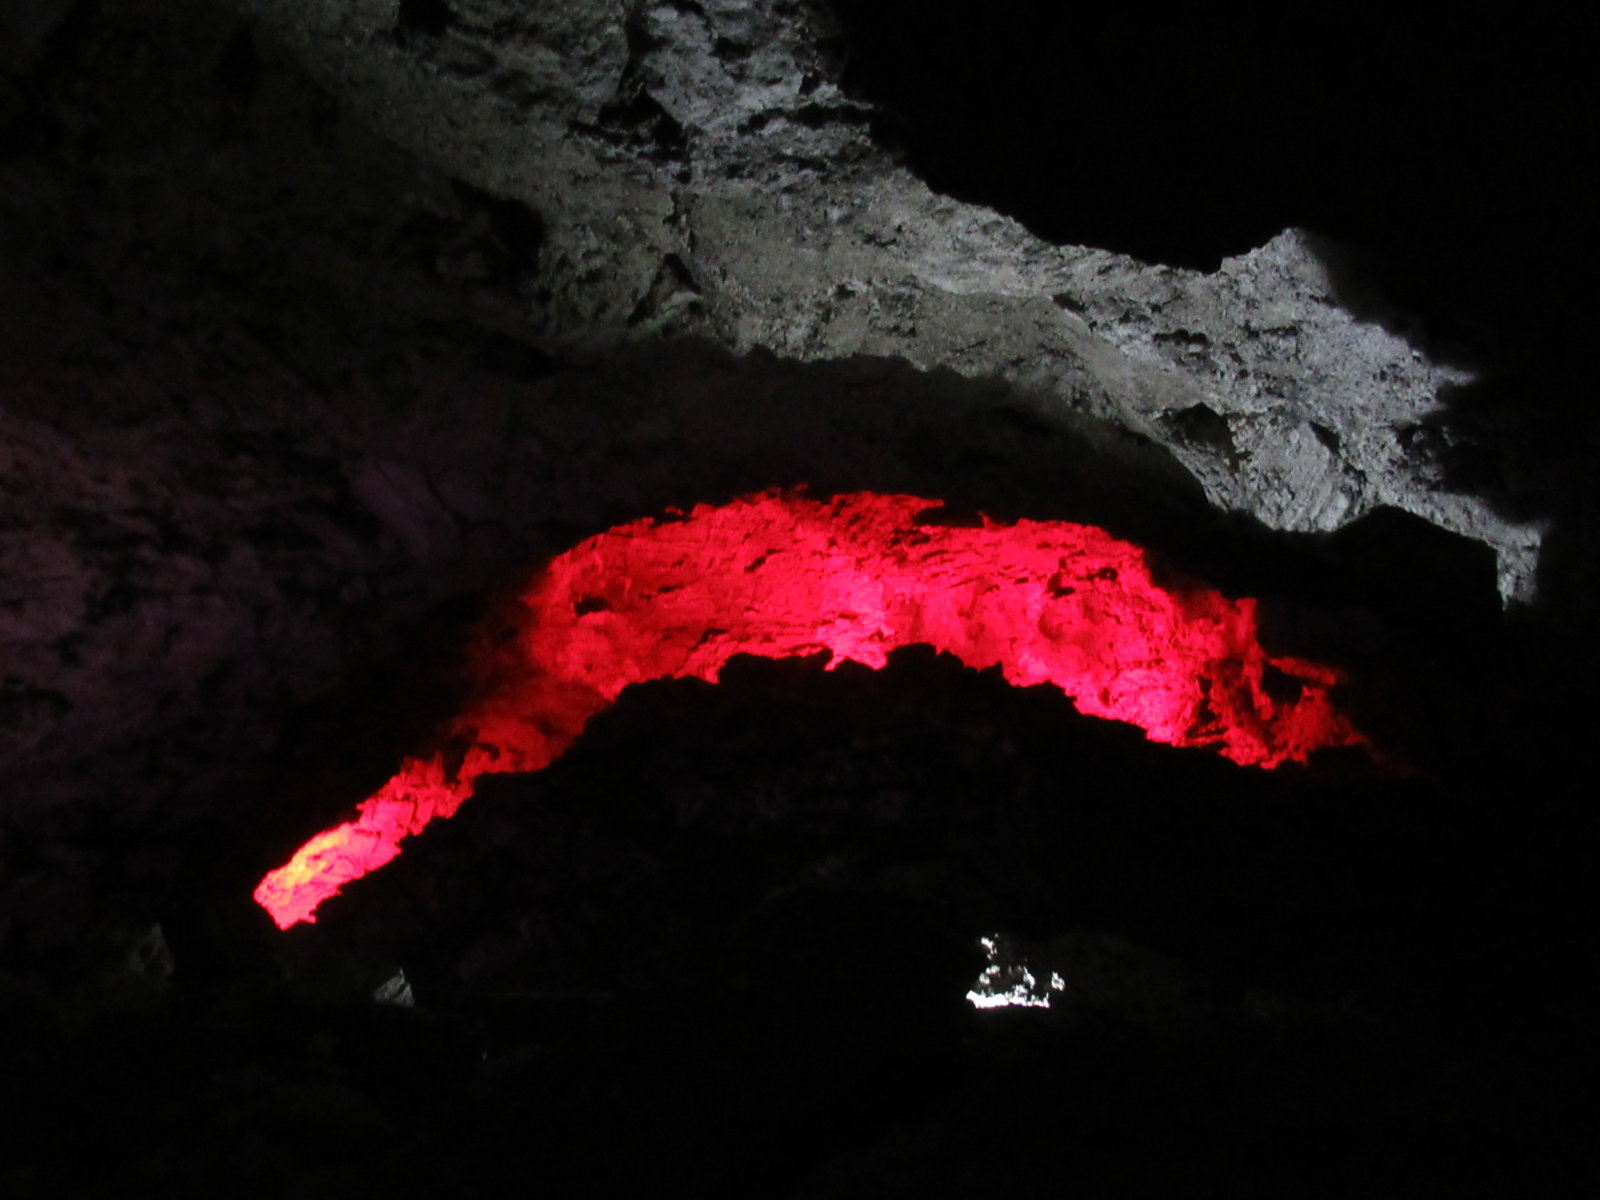 08-30 Cave Rocks 02